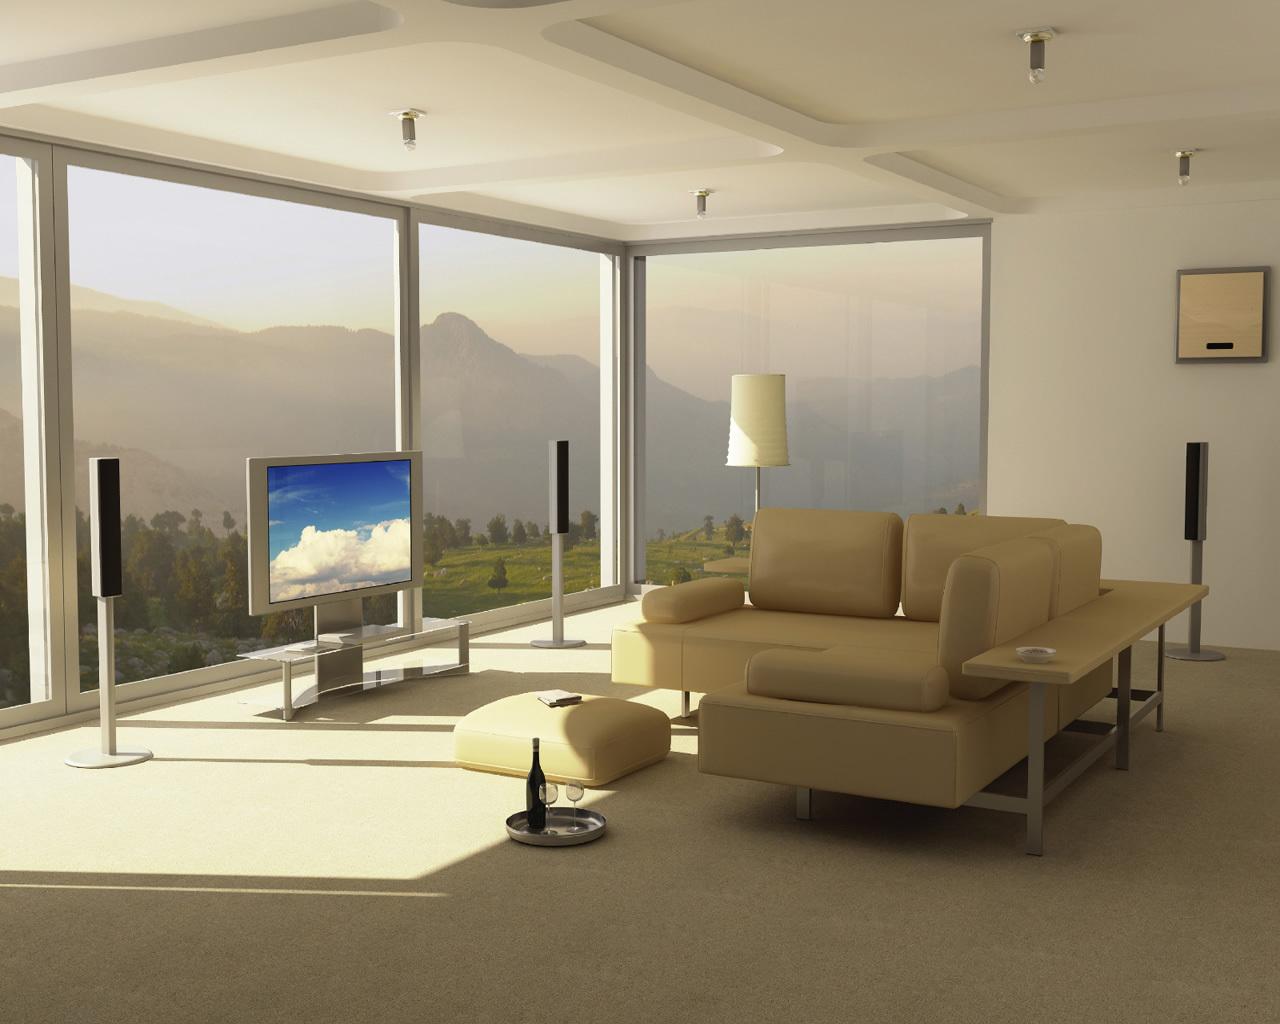 Interior Design Ideas For Living Rooms 2013